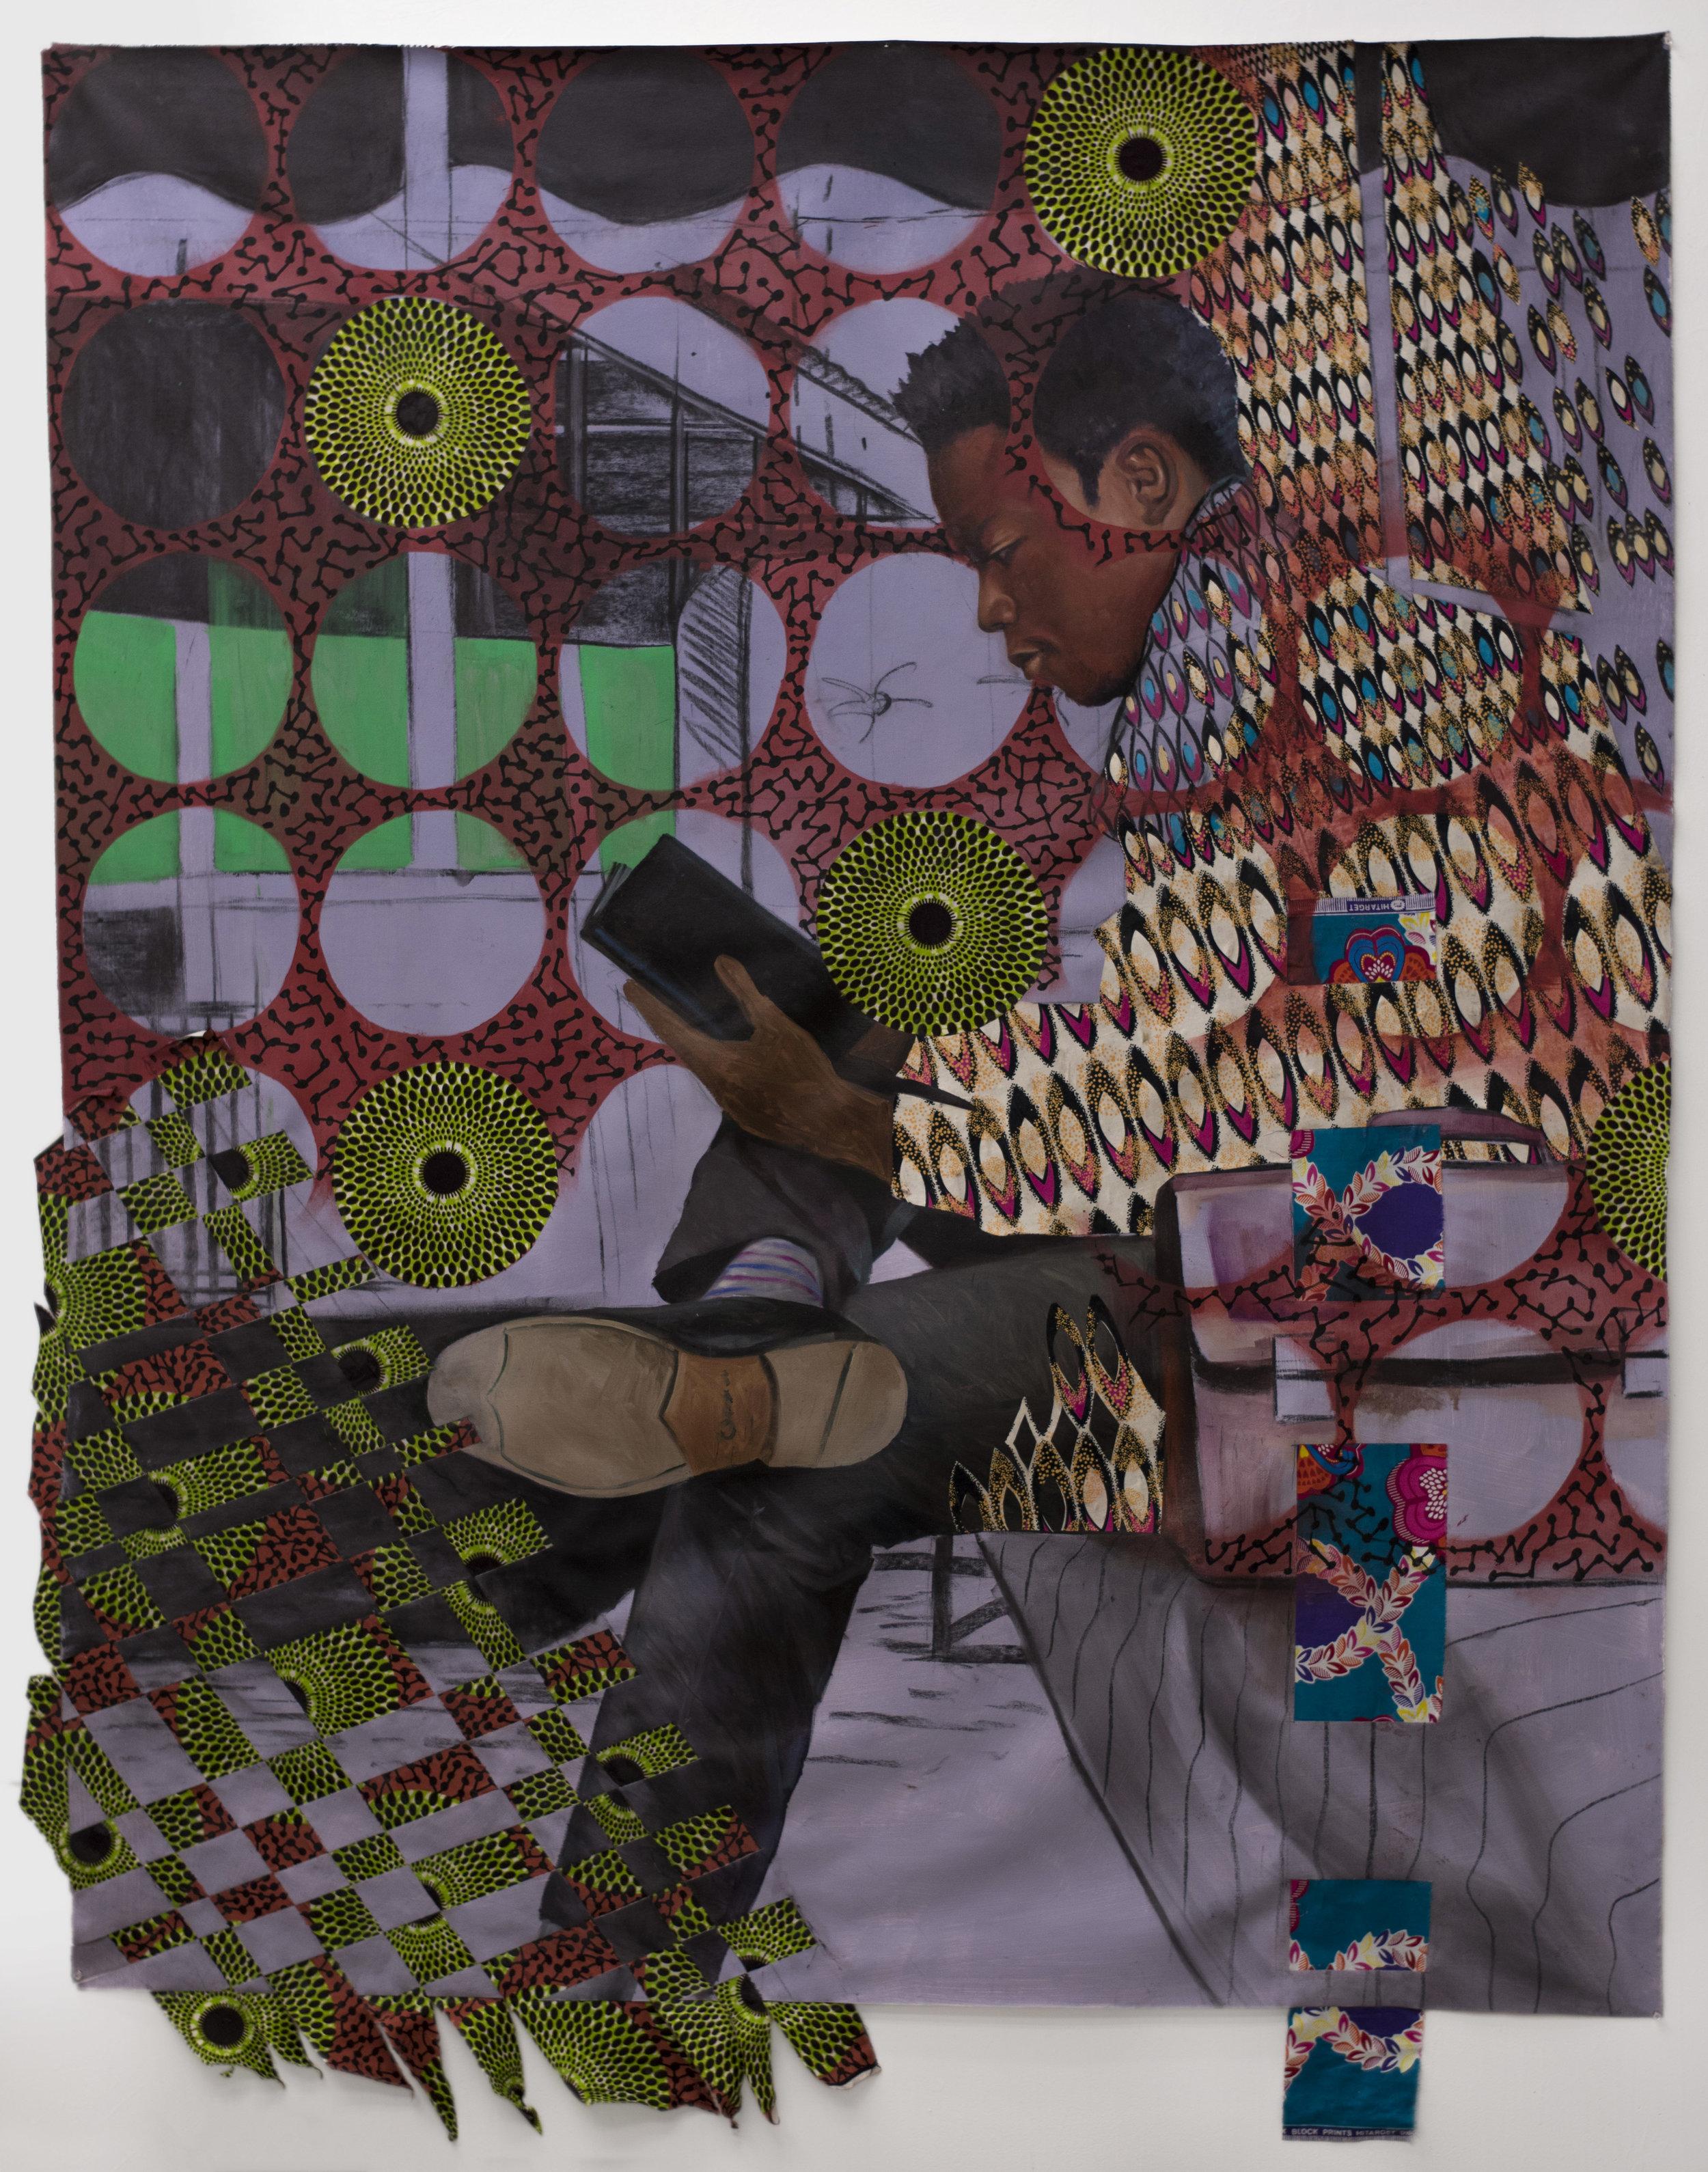 Patrick Quarm  -  PATHOS, ETHOS, LOGOS , 2017 Mixed media (Oil on African print fabric) 70h x 59w inches